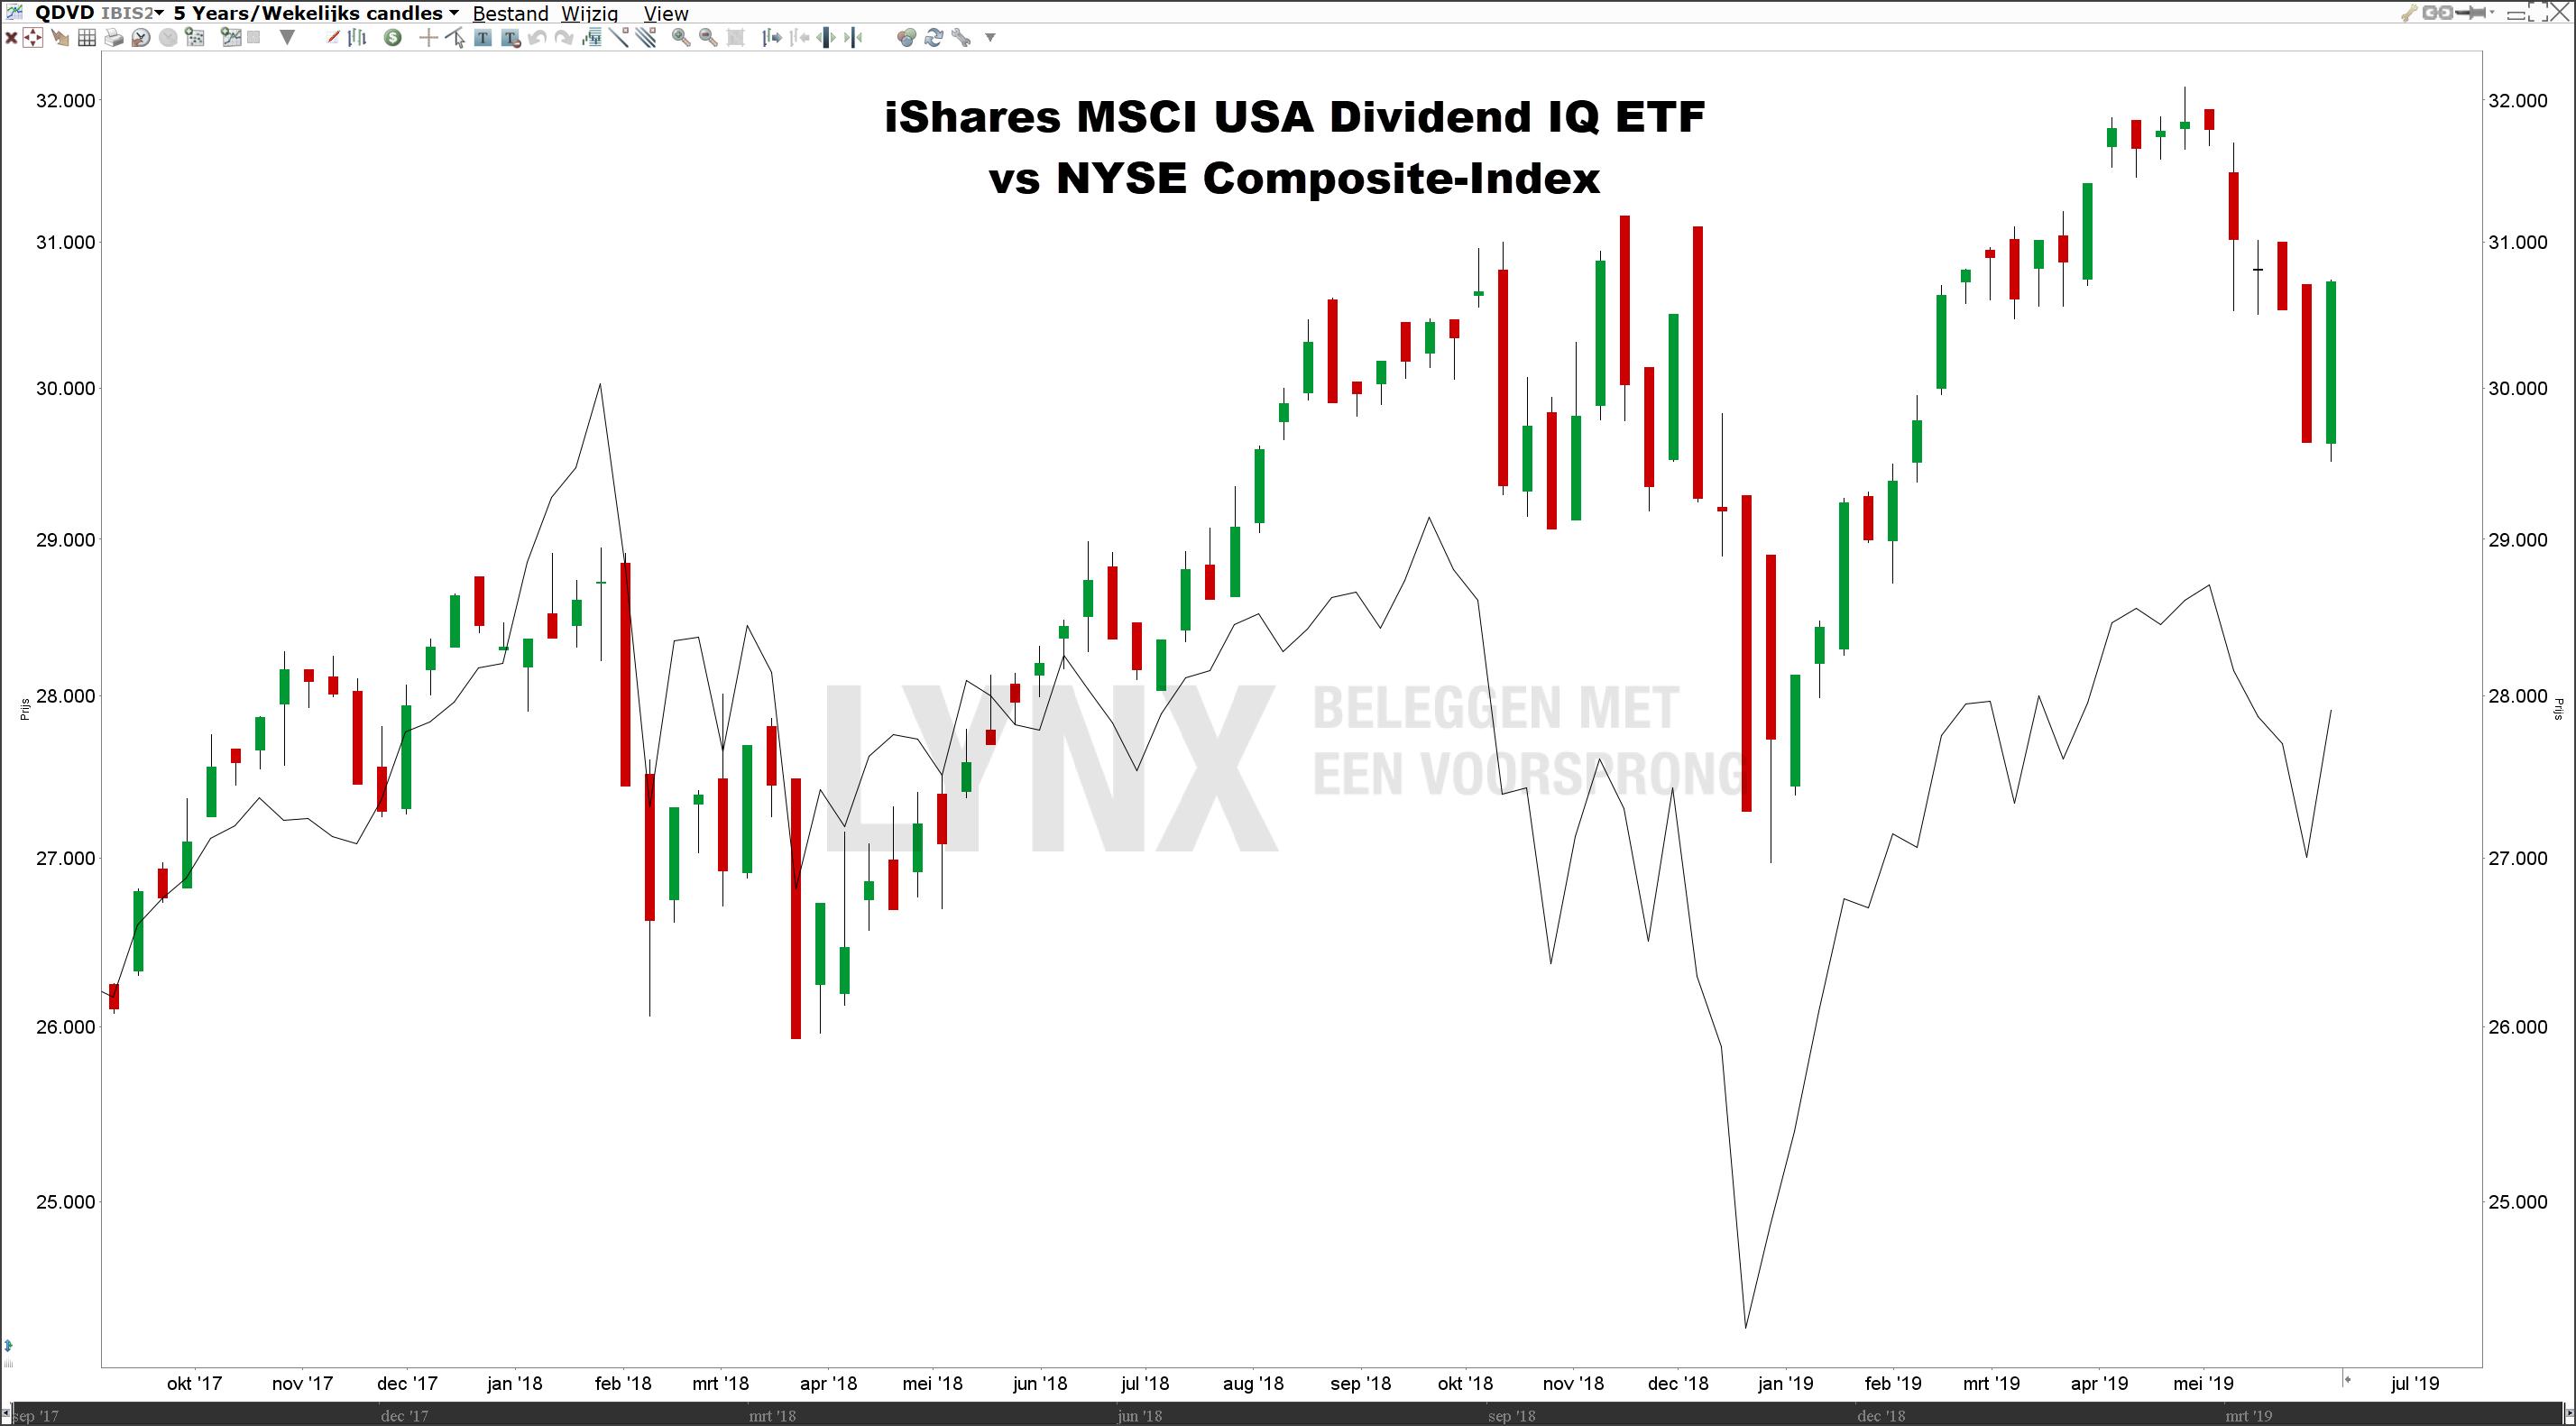 Beste dividend ETF ishares MSCI USA Dividend IQ ETF